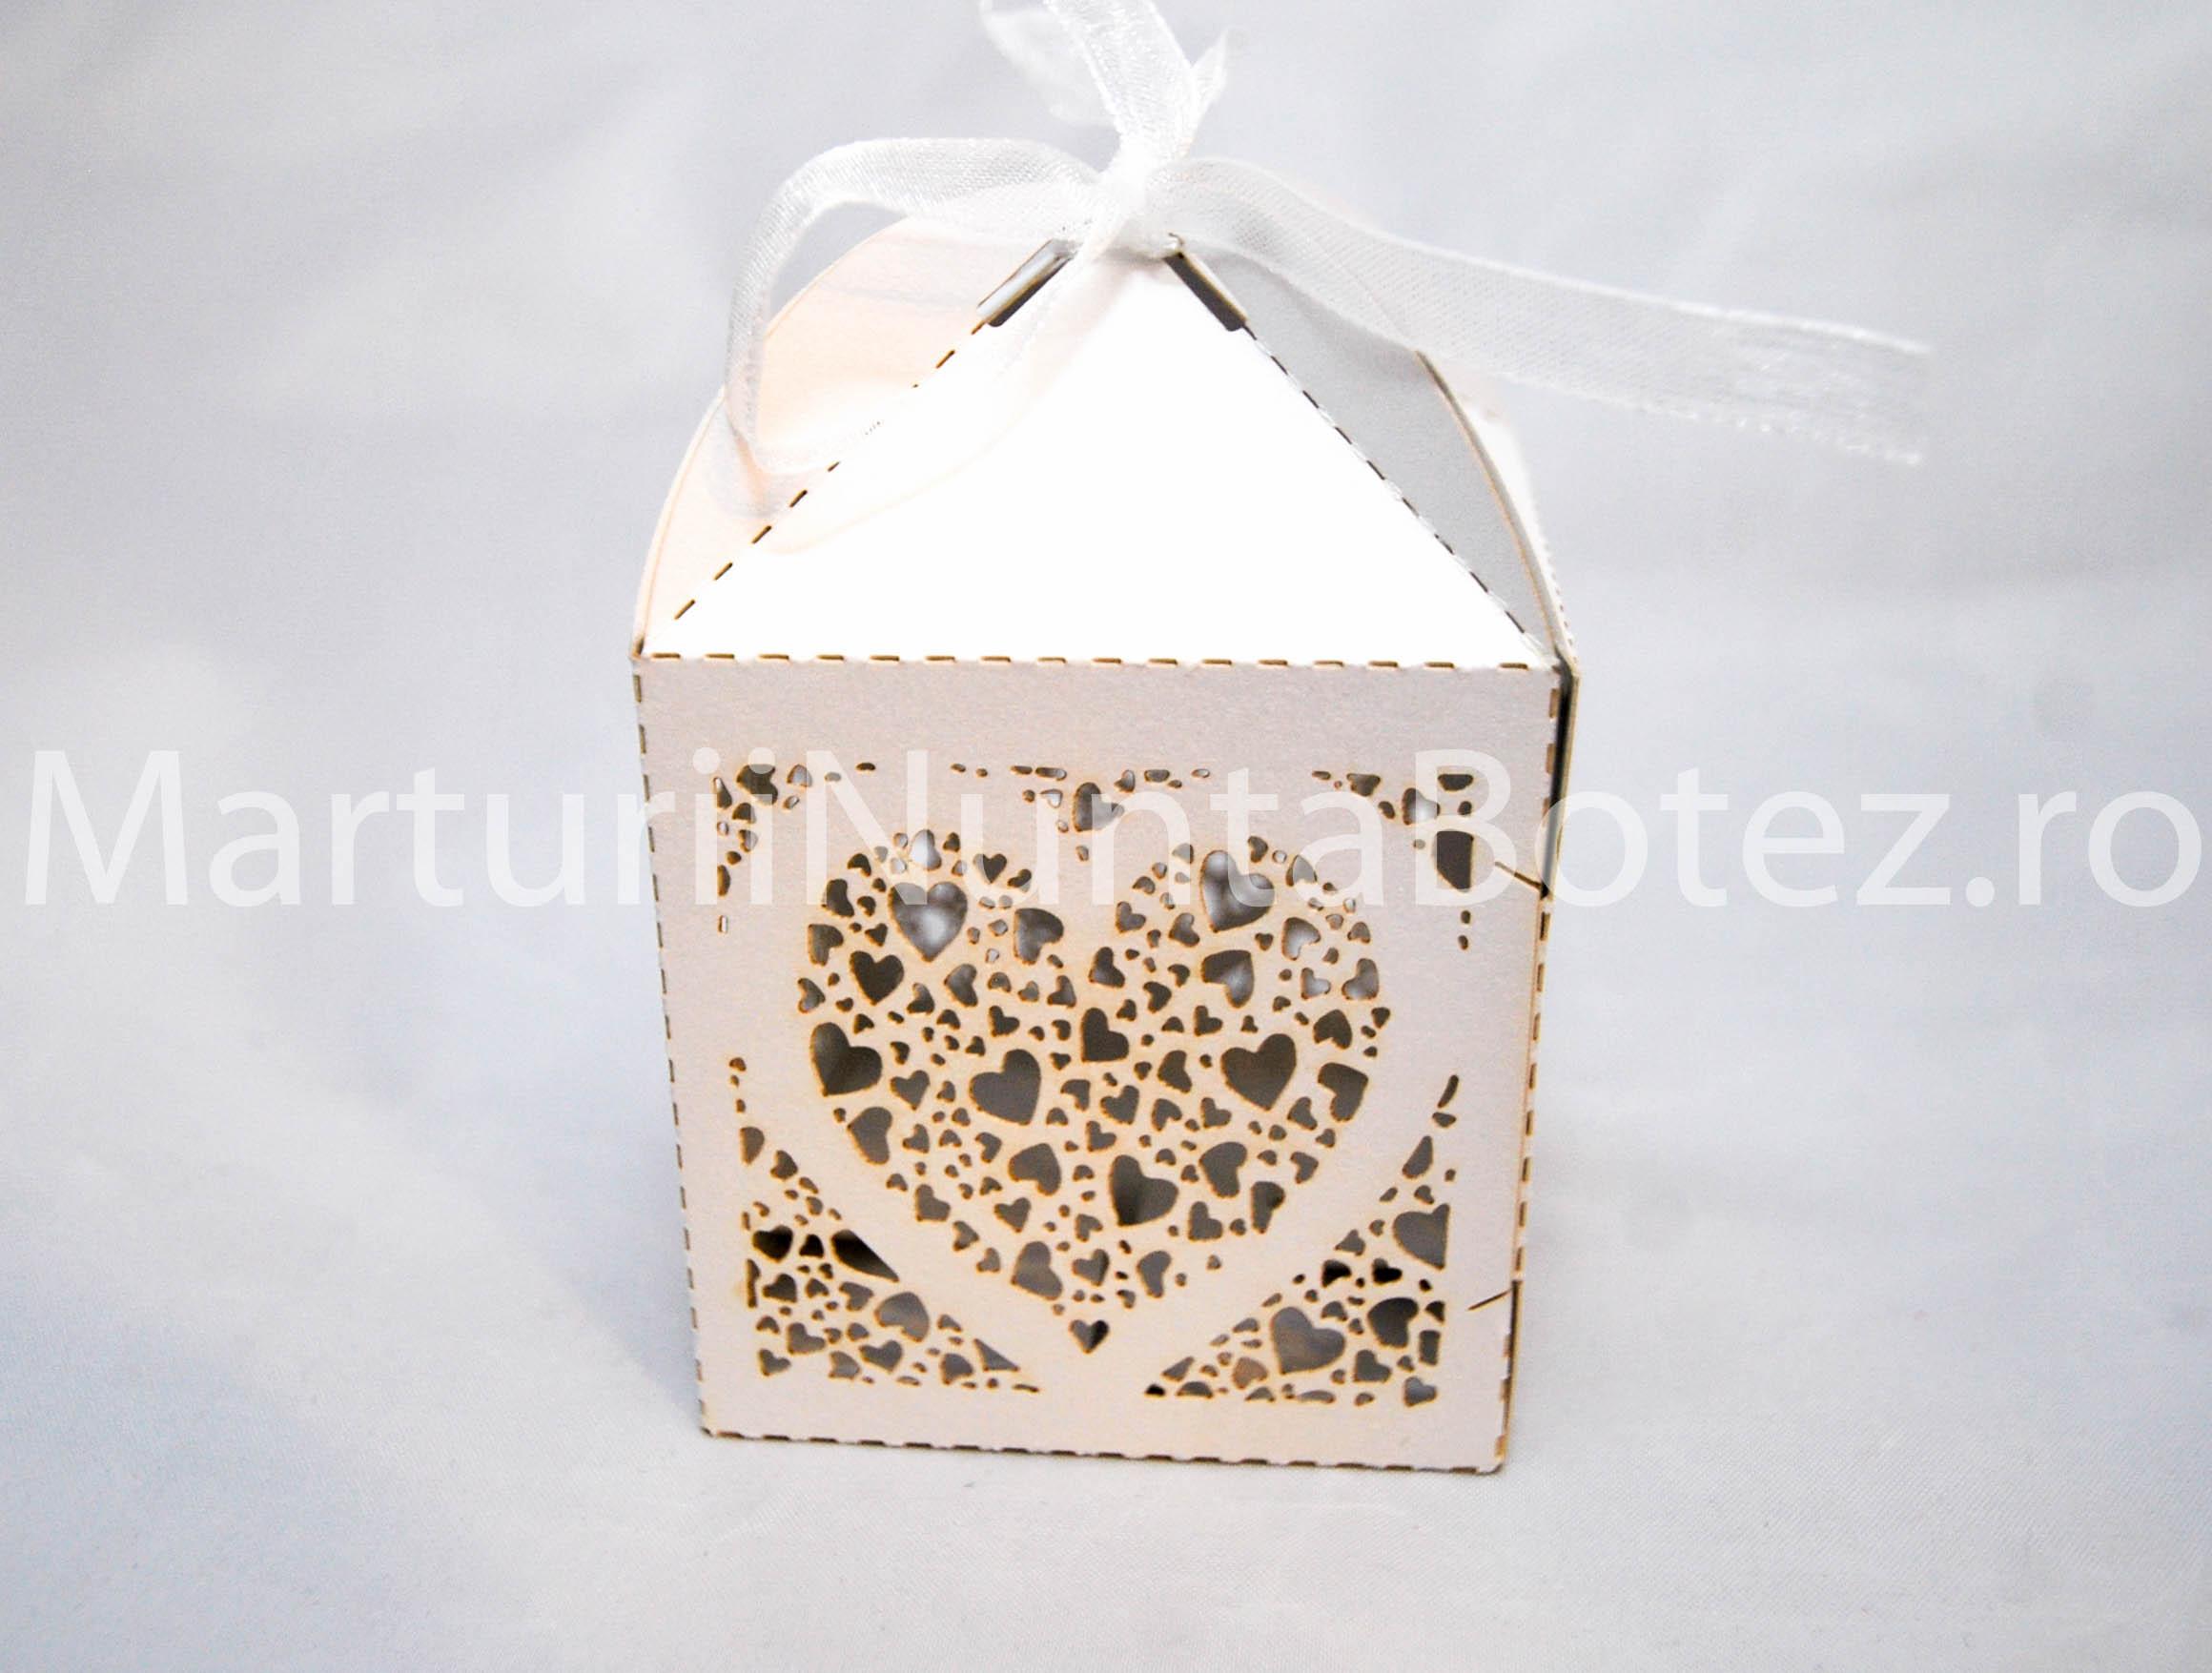 marturii_nunta_cutie_perforata_carton_model_inima_deosebita1